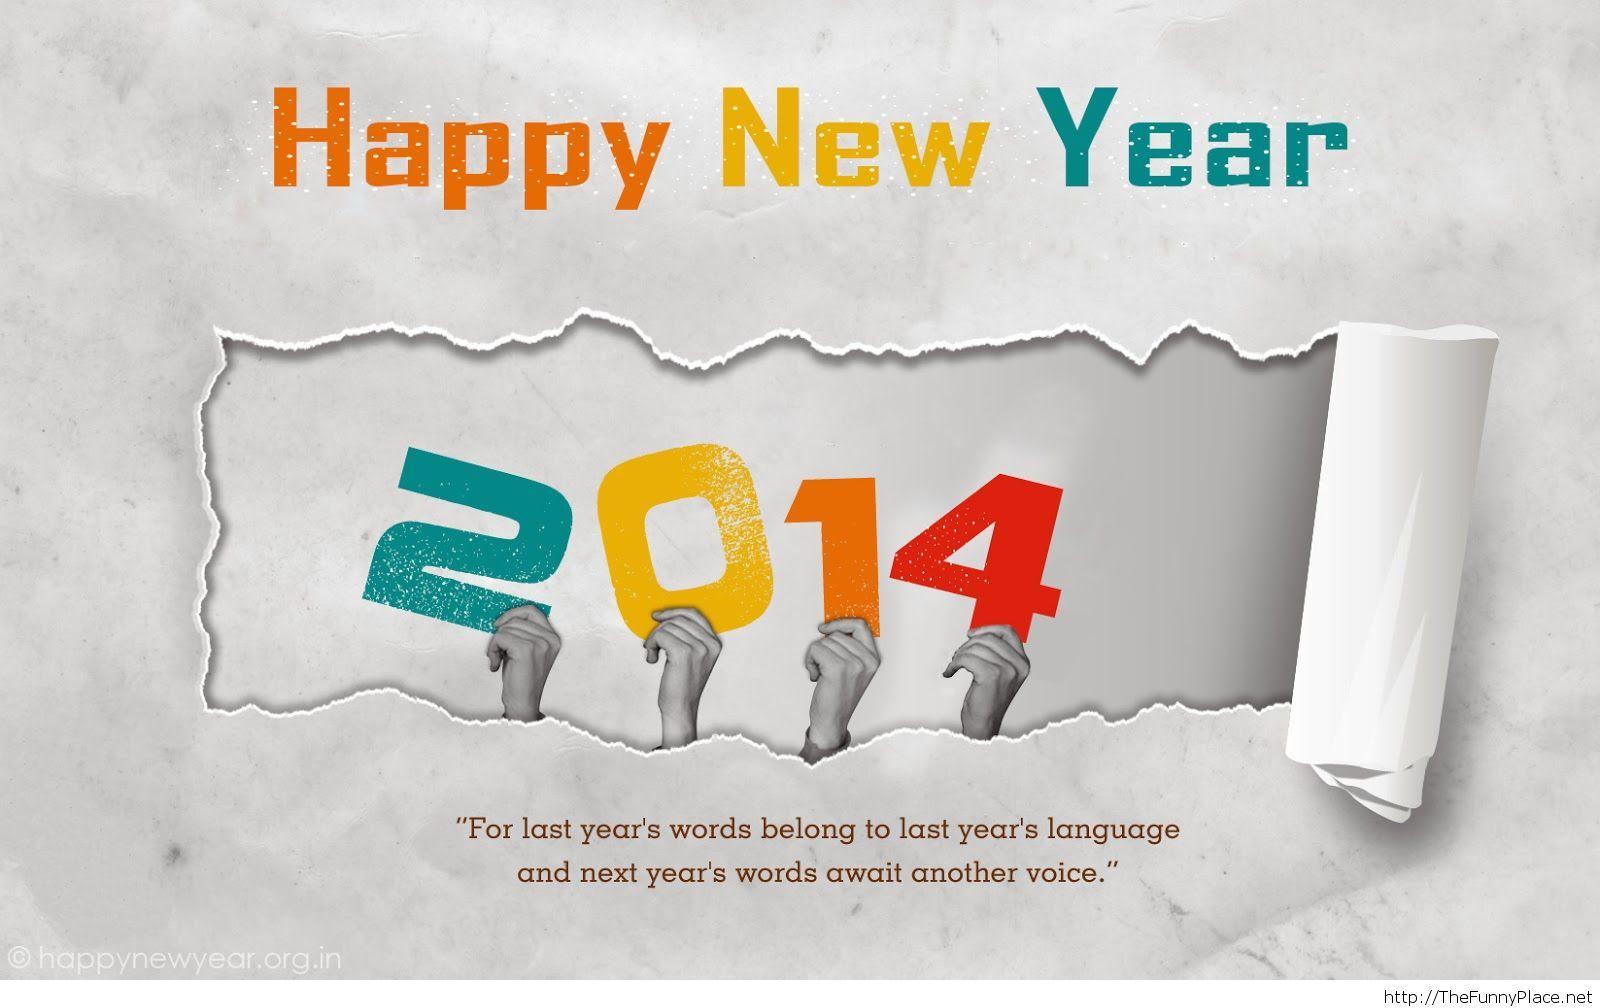 Happy new year 2014 quote